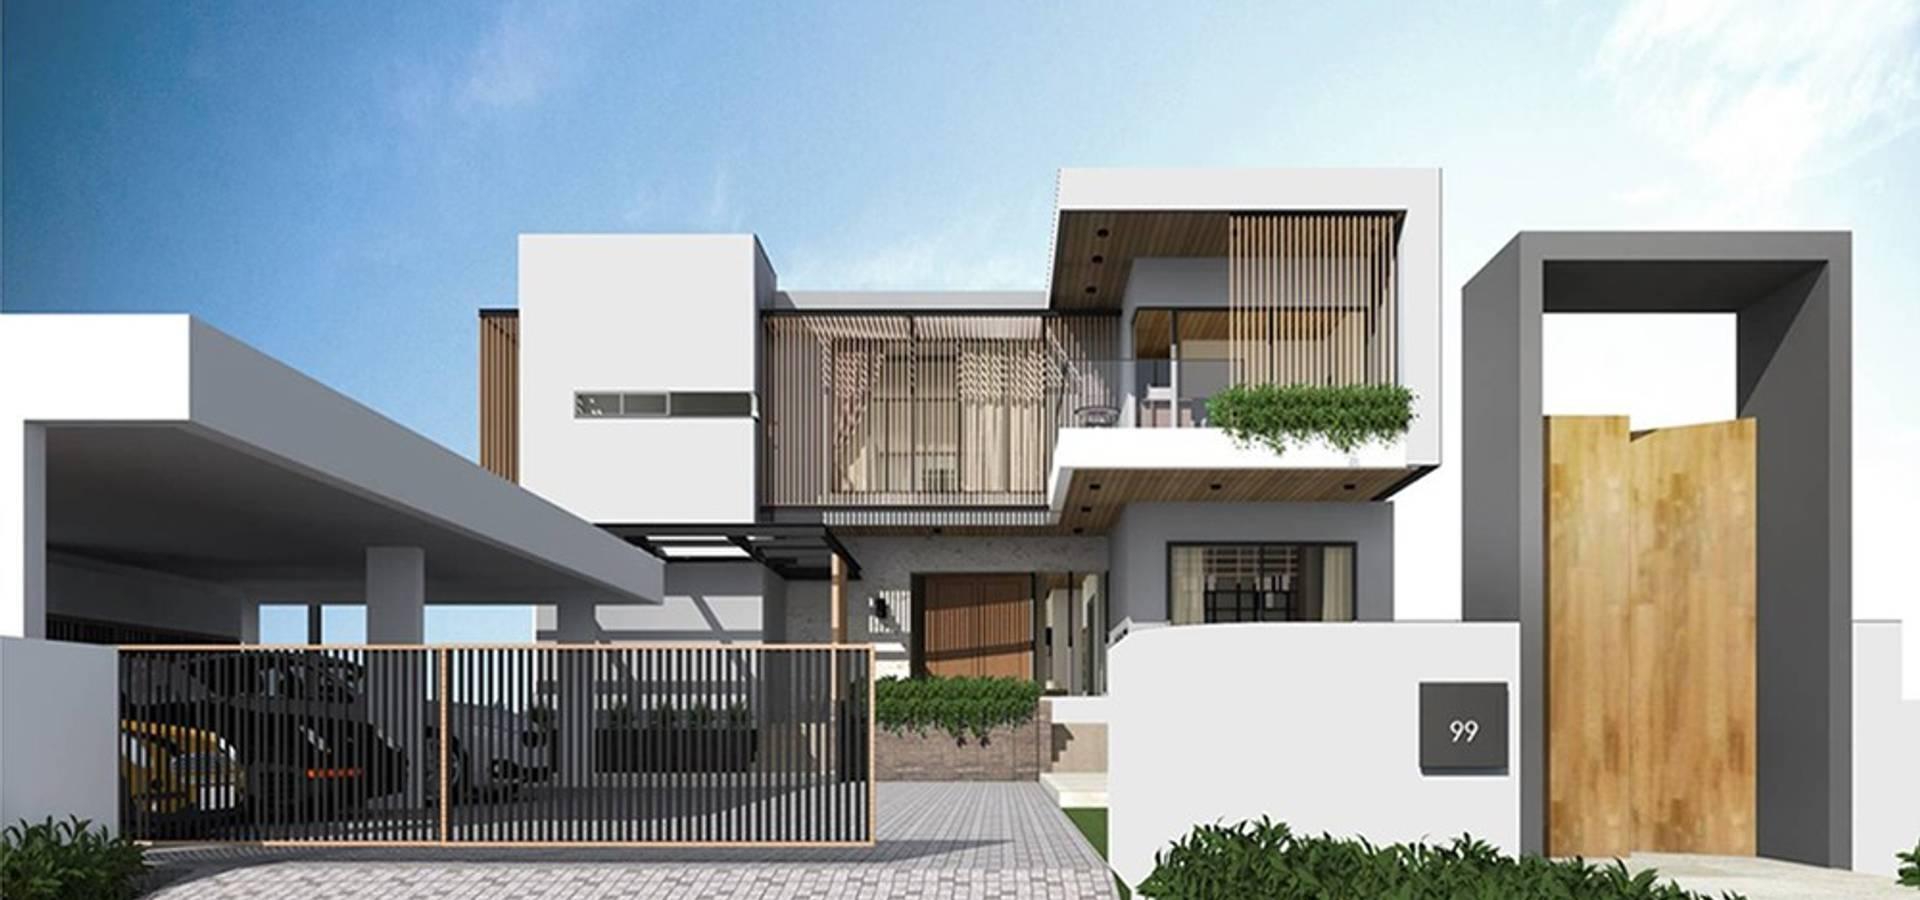 Apluscon Architects Ltd